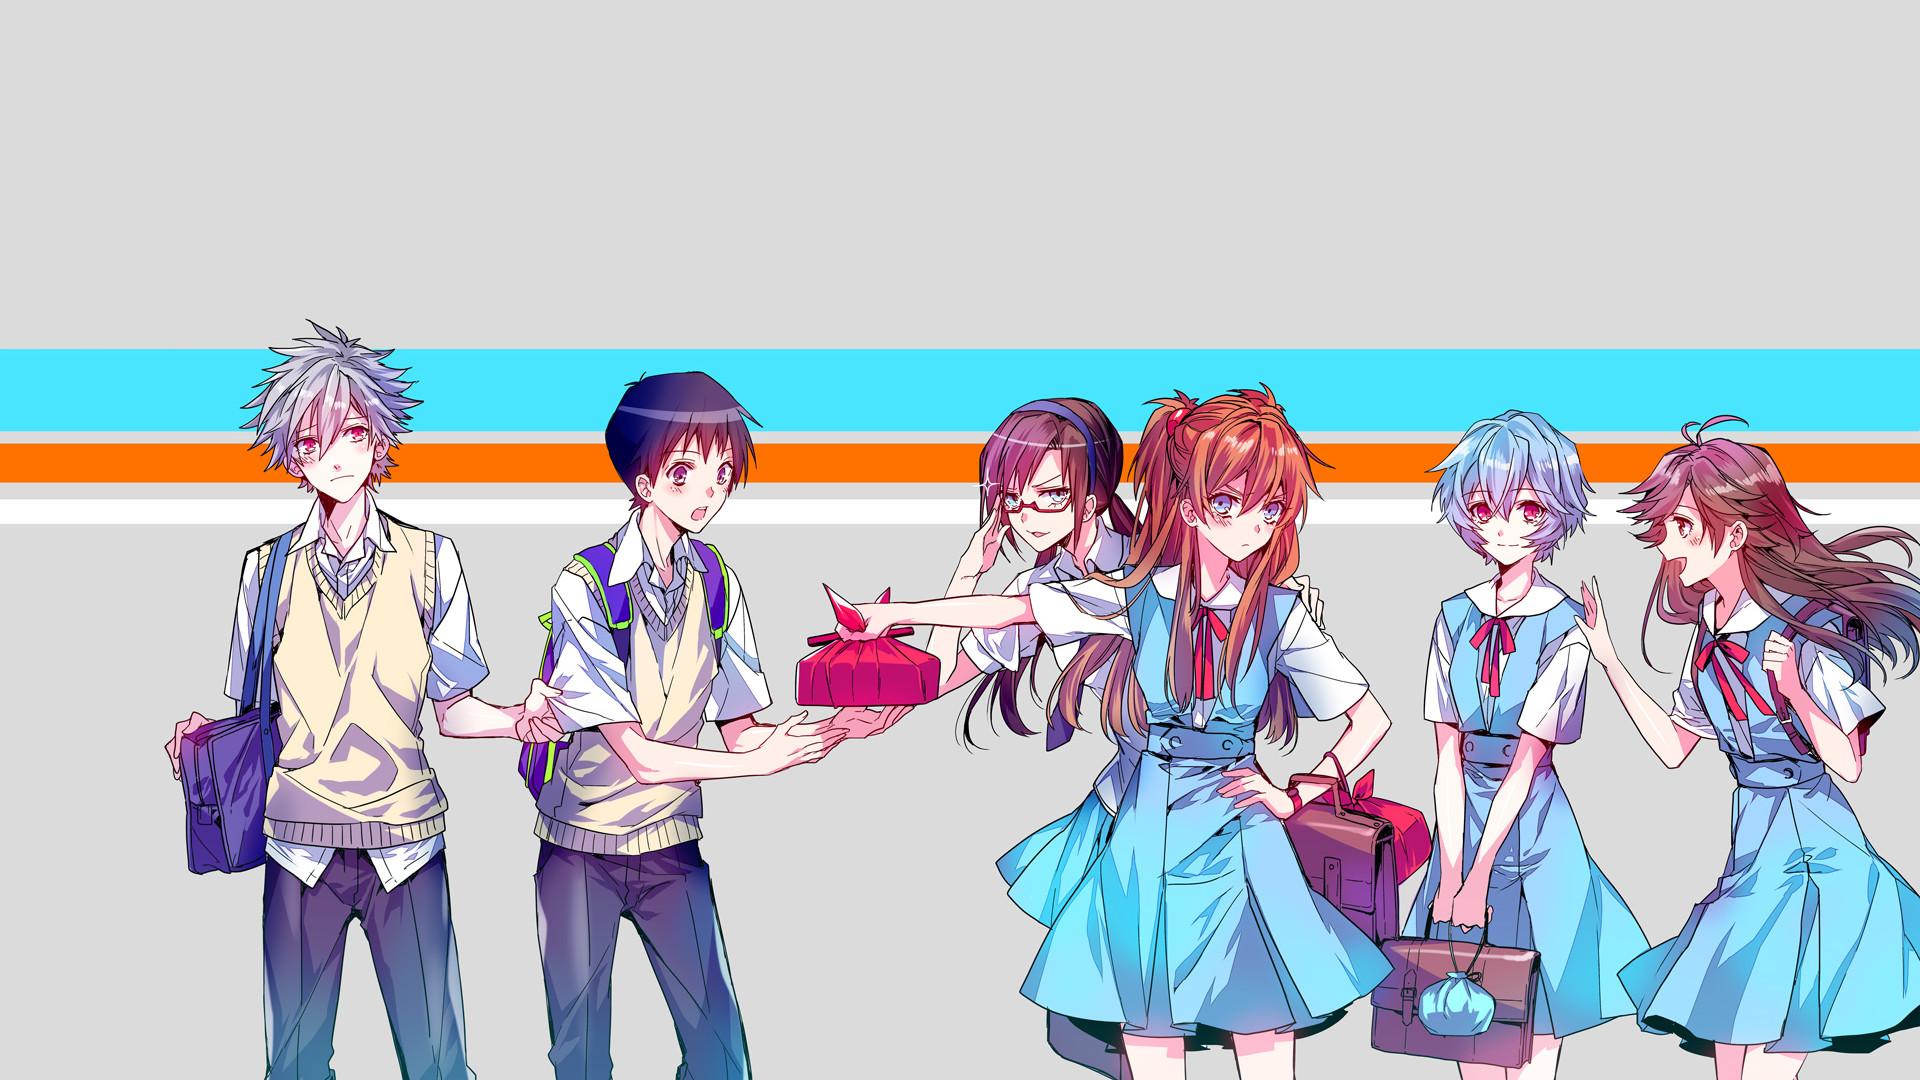 Anime – Neon Genesis Evangelion Asuka Langley Sohryu Rei Ayanami Shinji  Ikari Mari Makinami Illustrious Kaworu